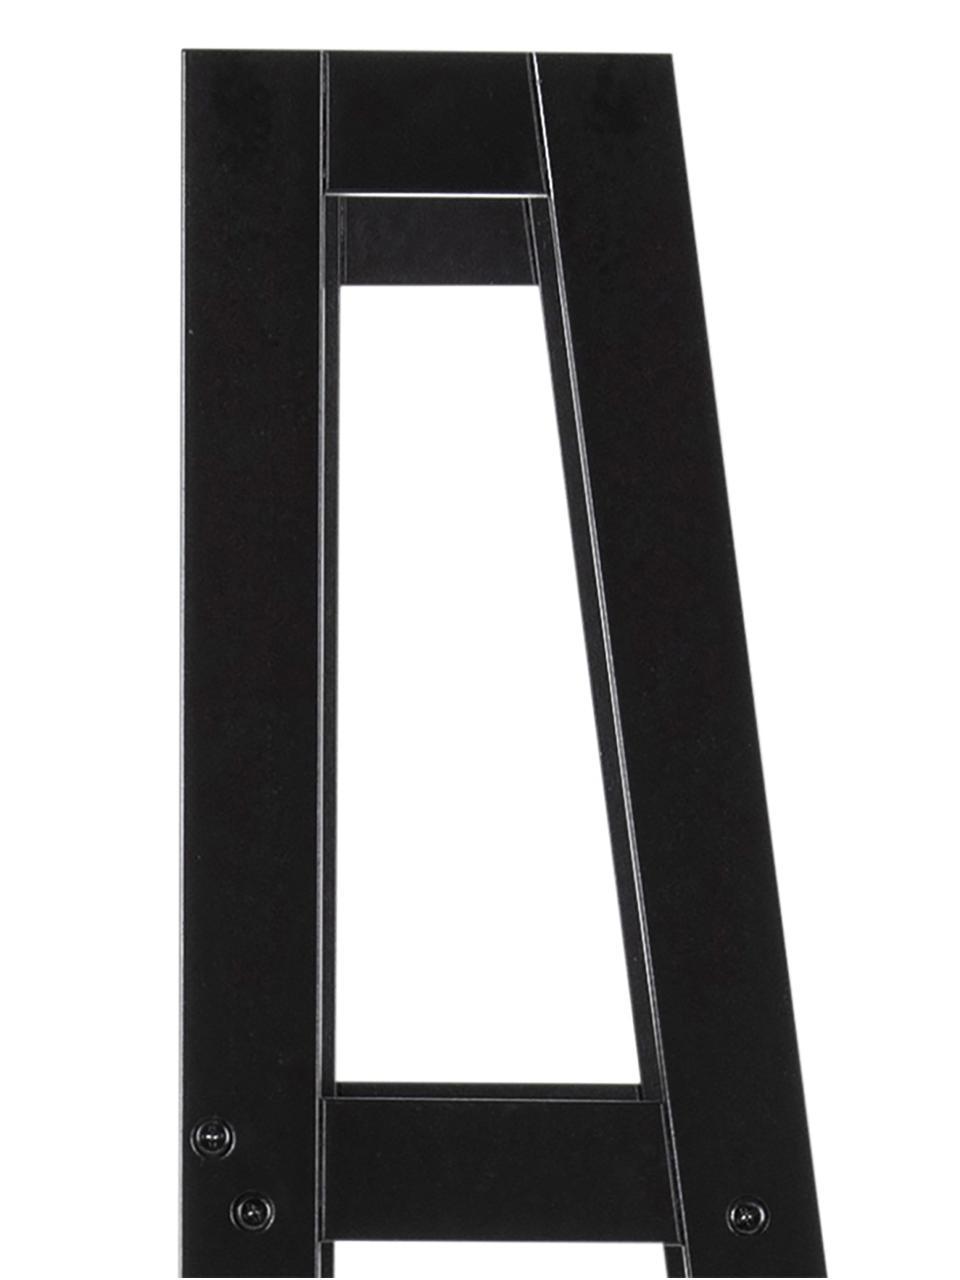 Wandrek Wally in zwart, Gelakt MDF, Zwart, 63 x 180 cm